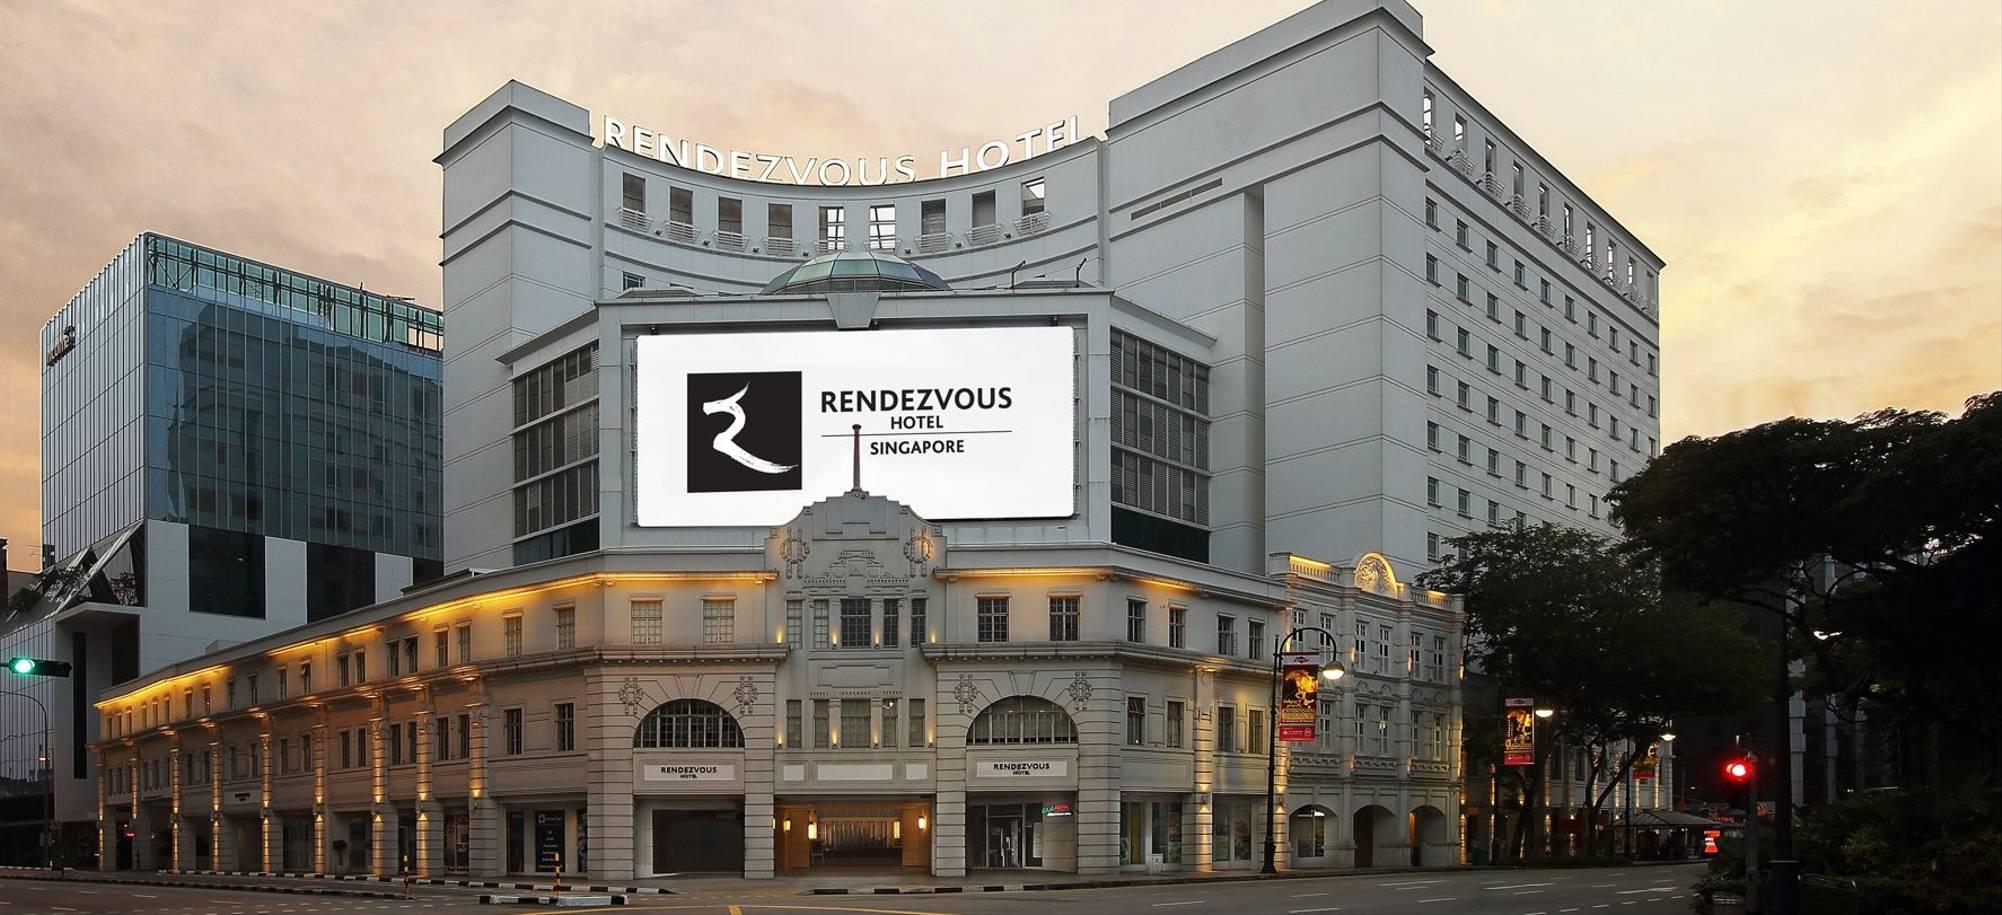 Singapore   Rendezvous Hotel   Itinerary Desktop